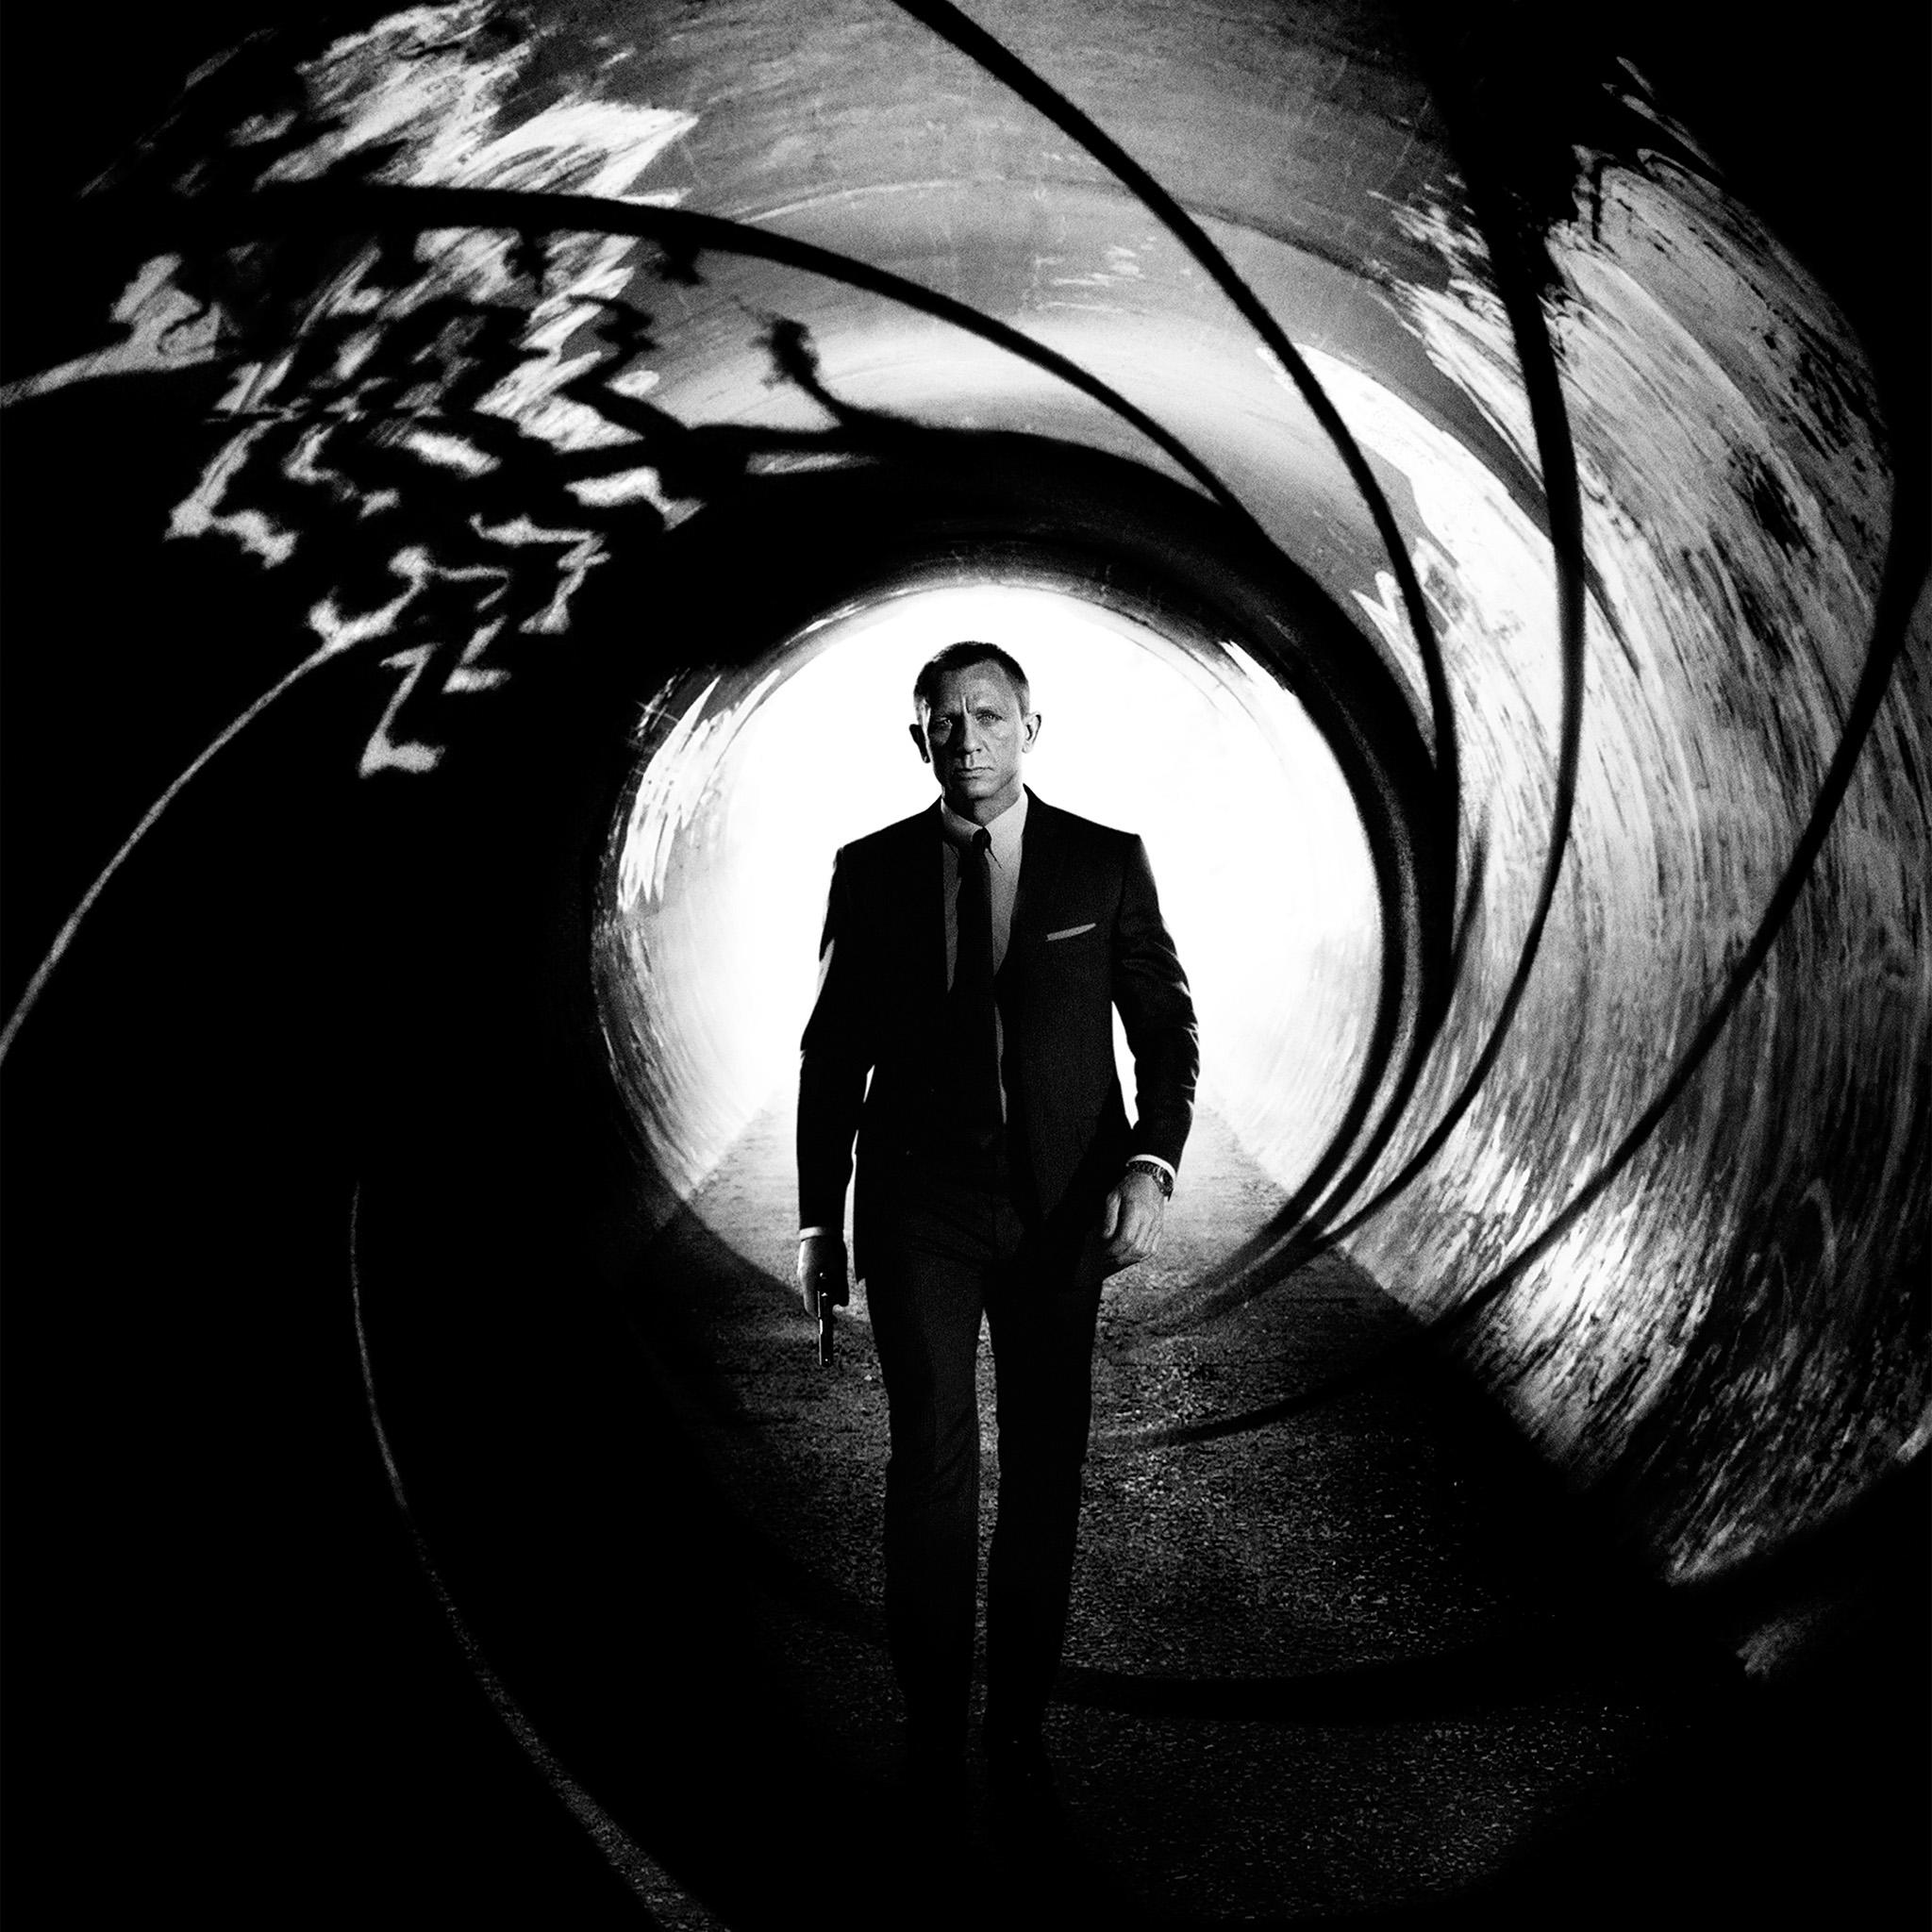 james bond 007 will - photo #41